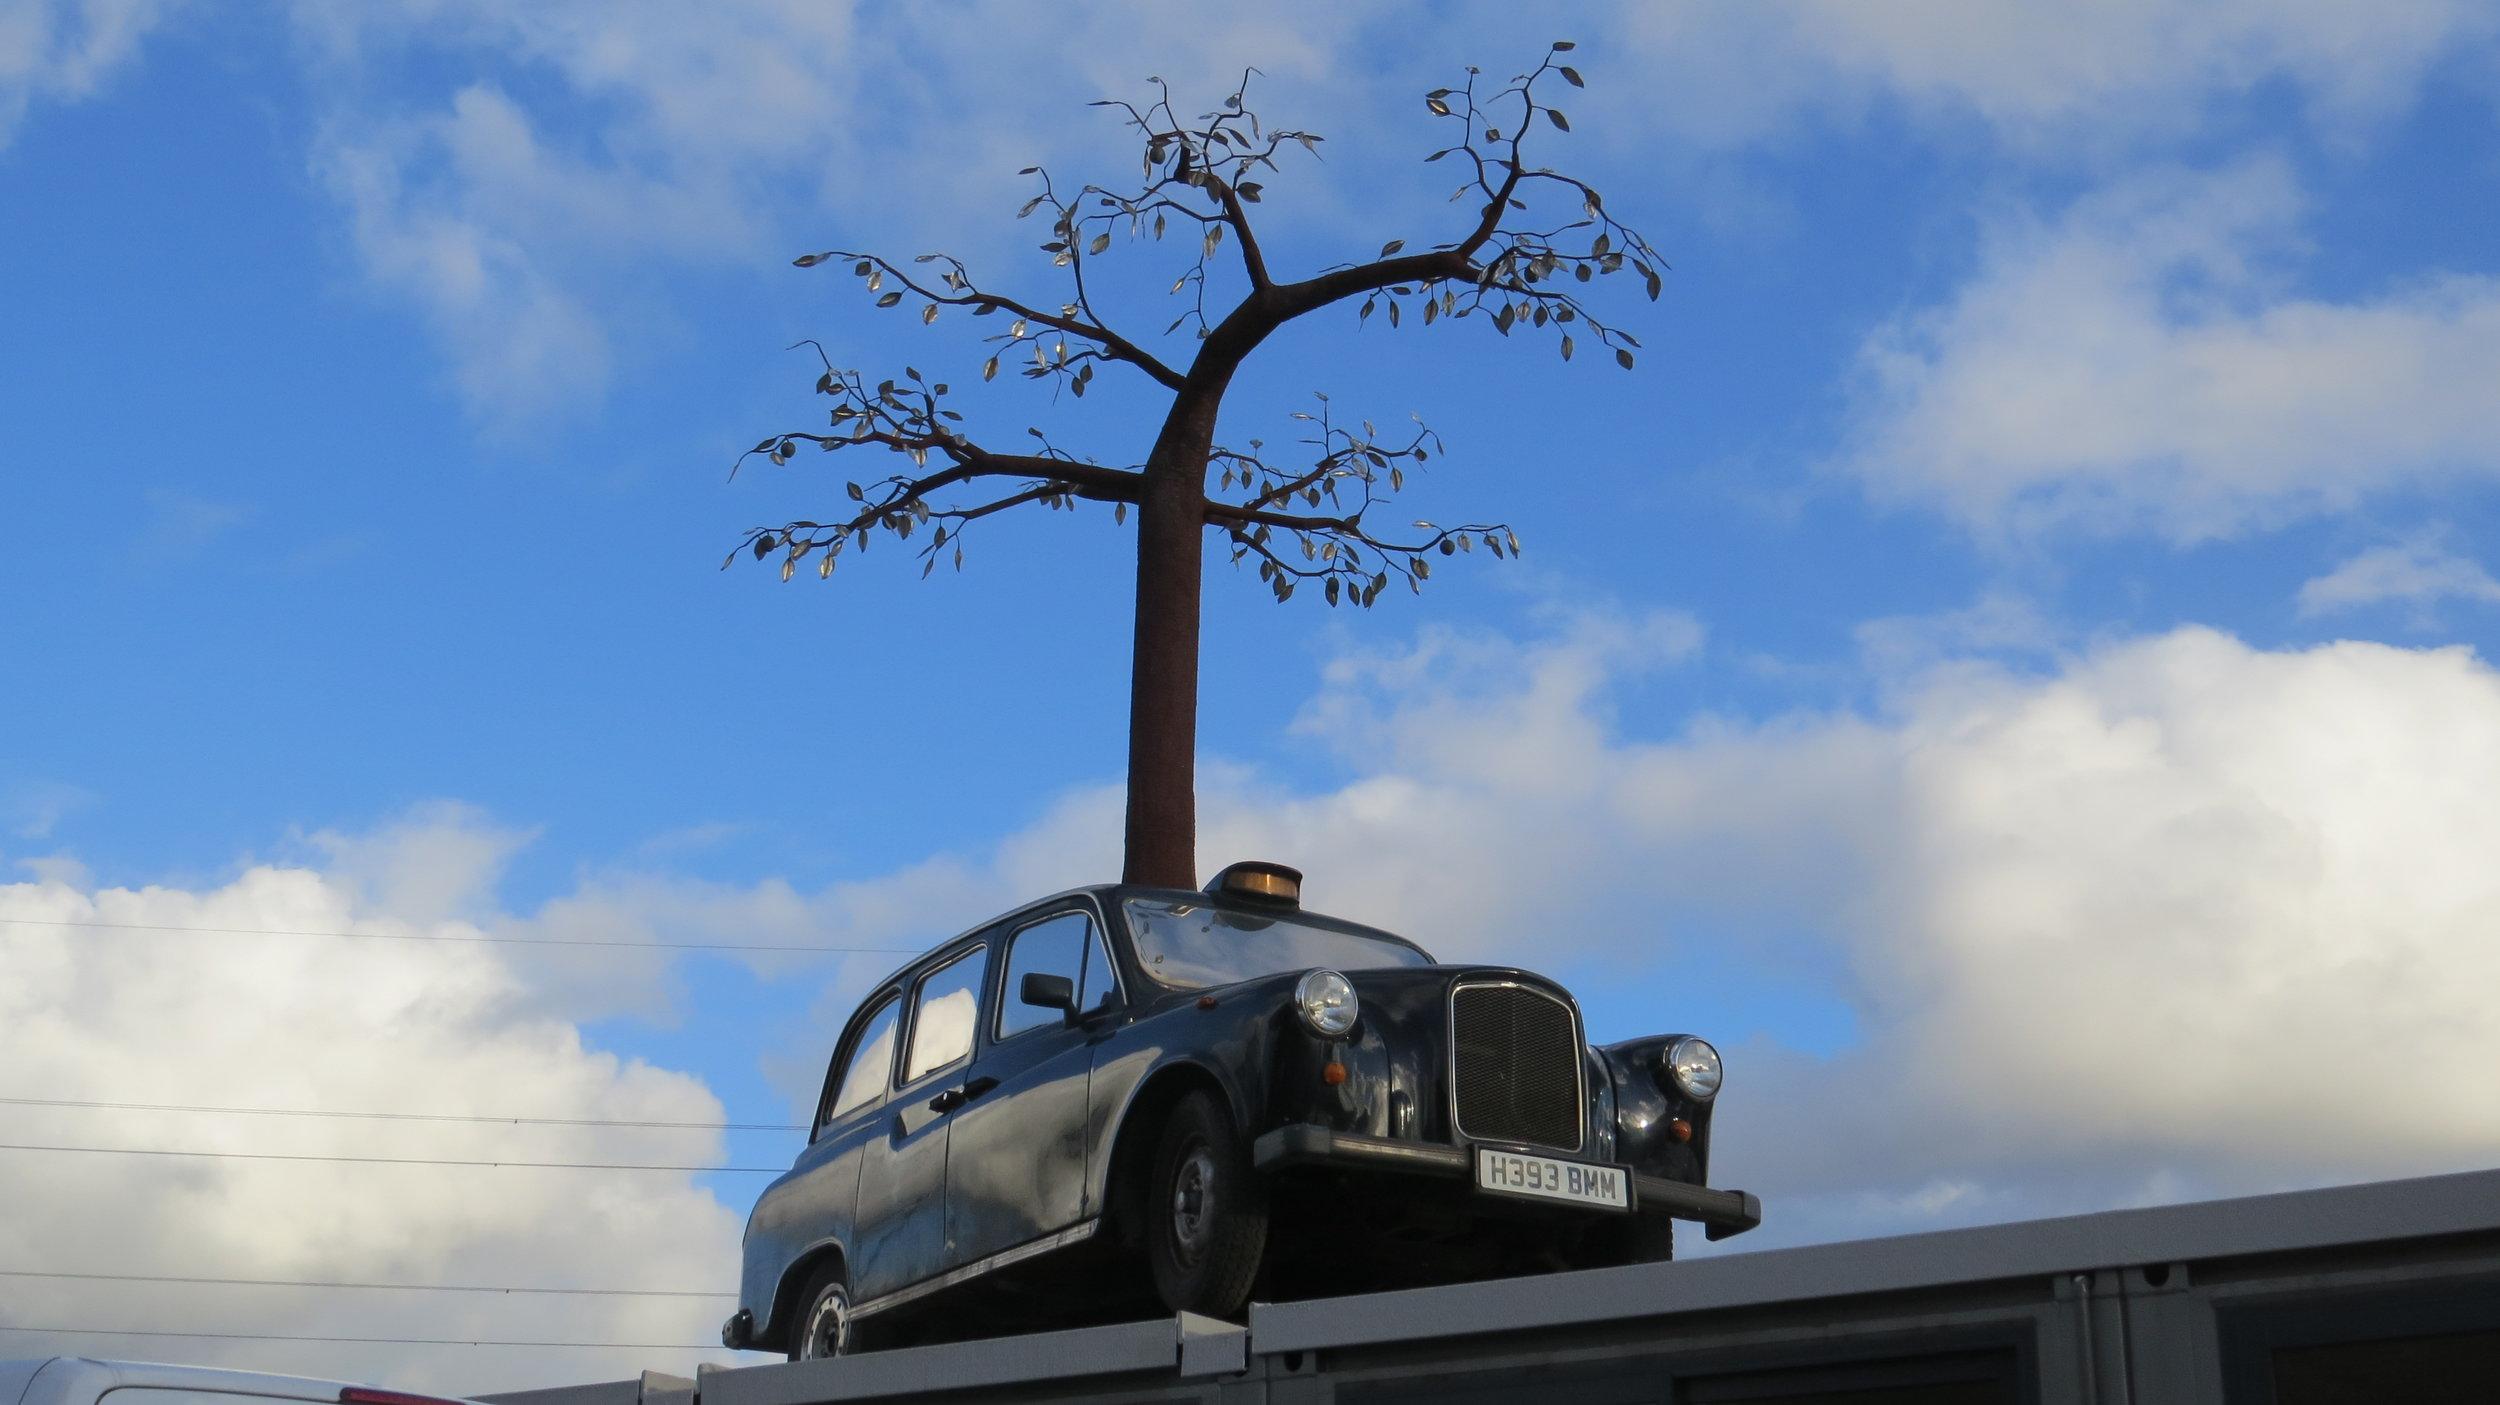 Tree & Taxi Sculpture